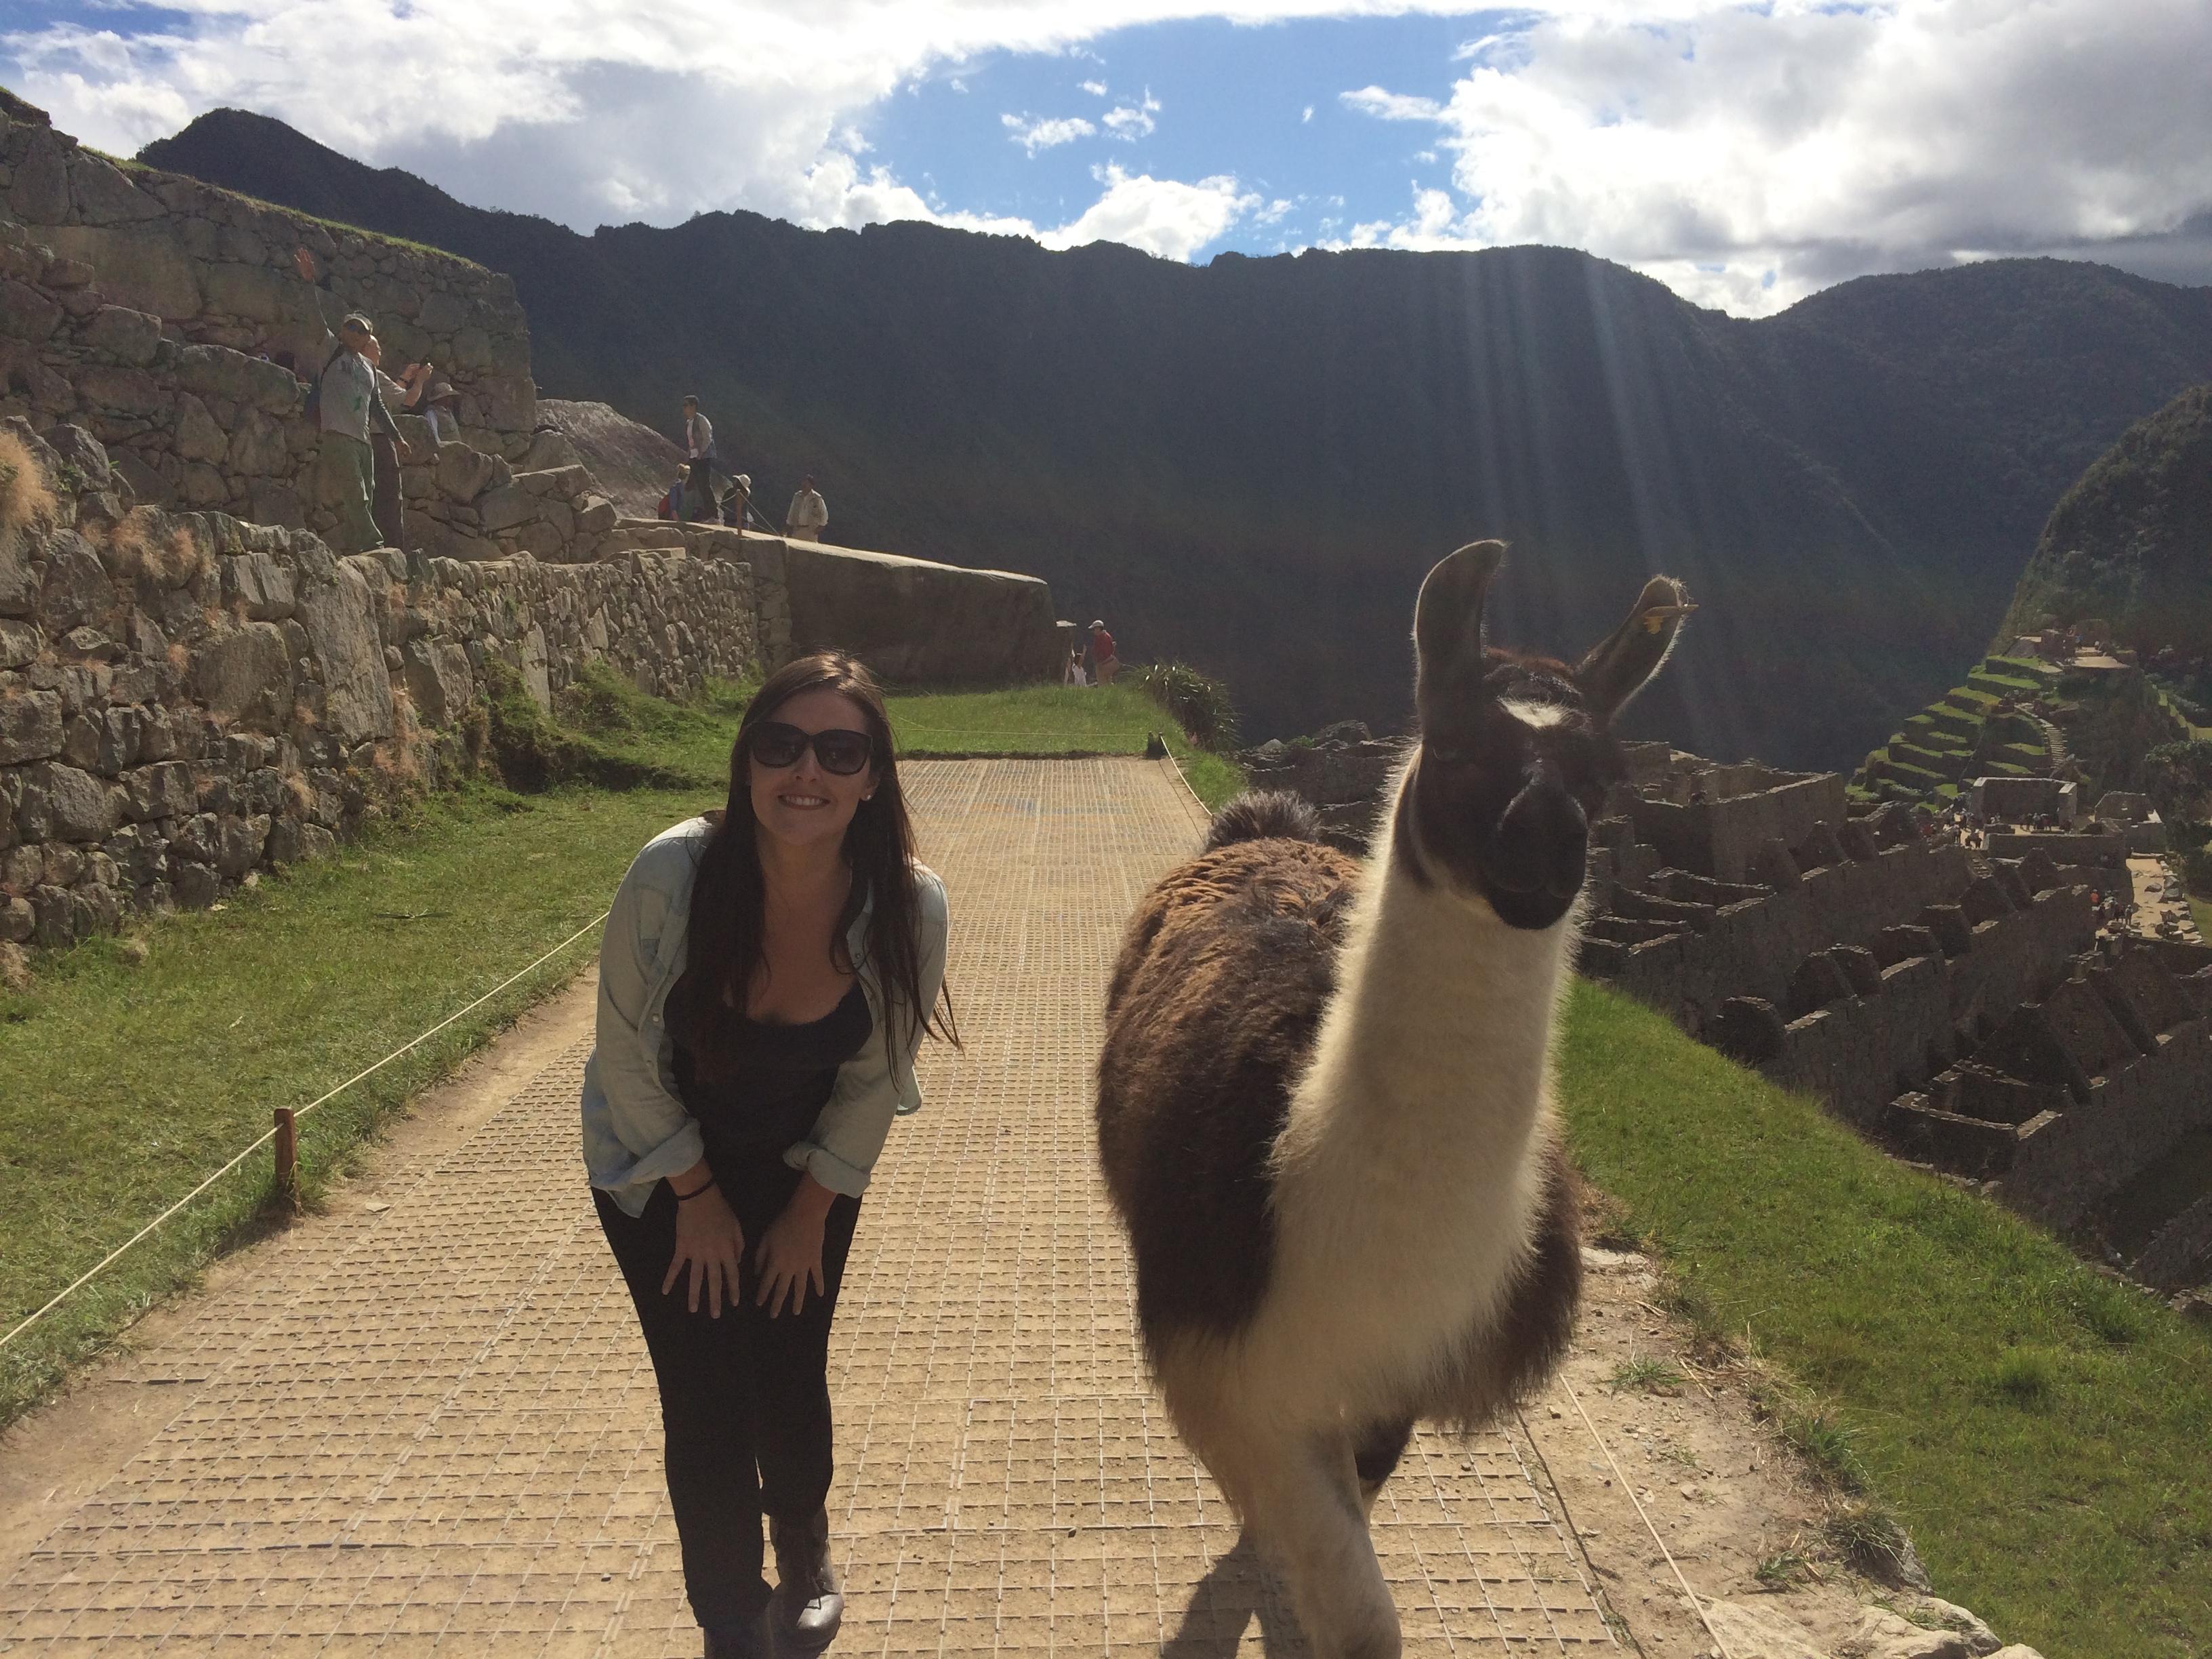 Lhama Machu Picchu Peru